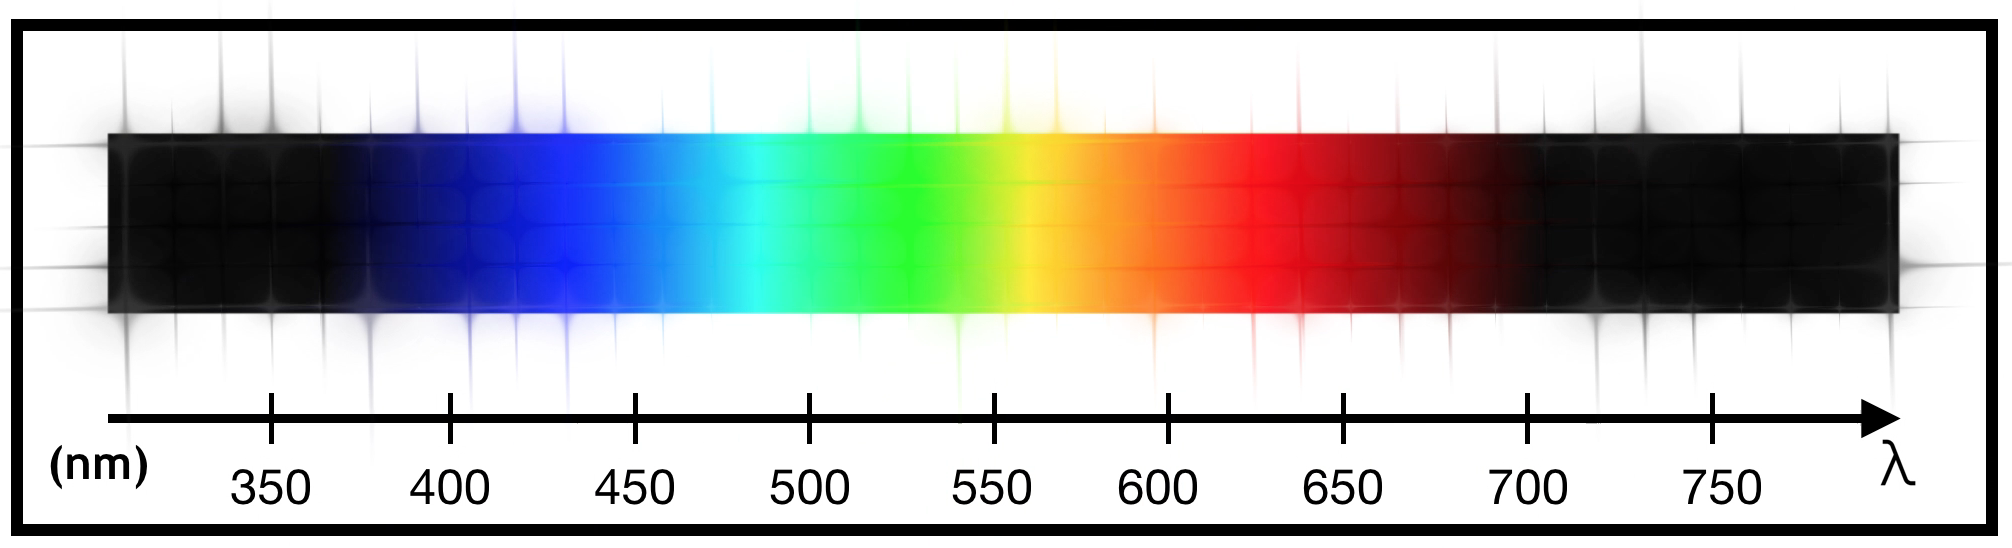 Artists impression of the light spectrum